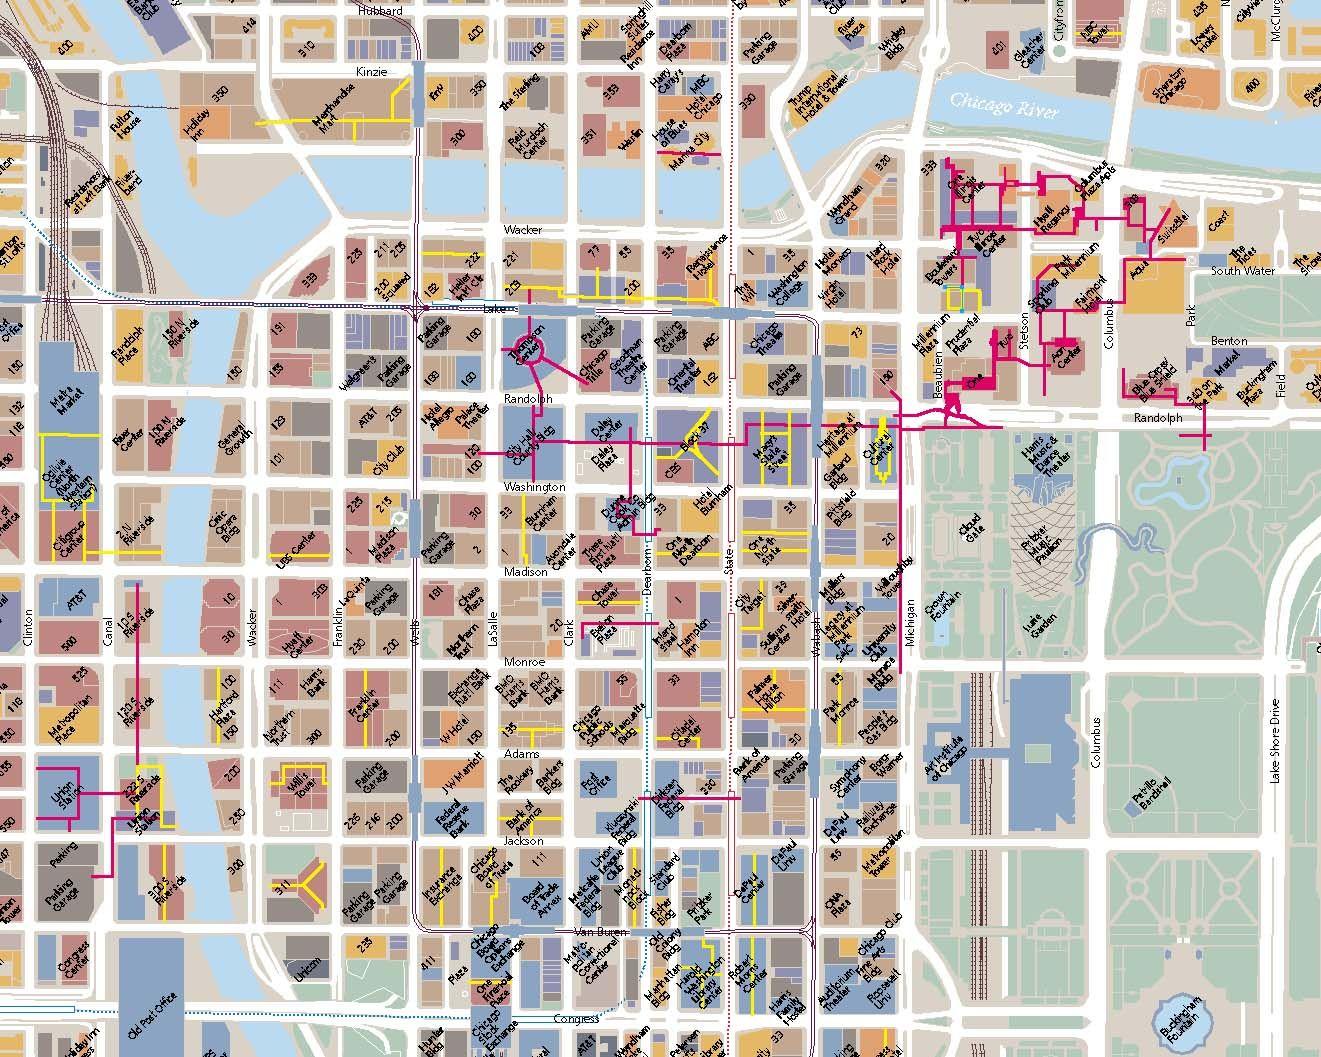 Chicago America Map.Pedway Map Chicago Underground World North America Chicago